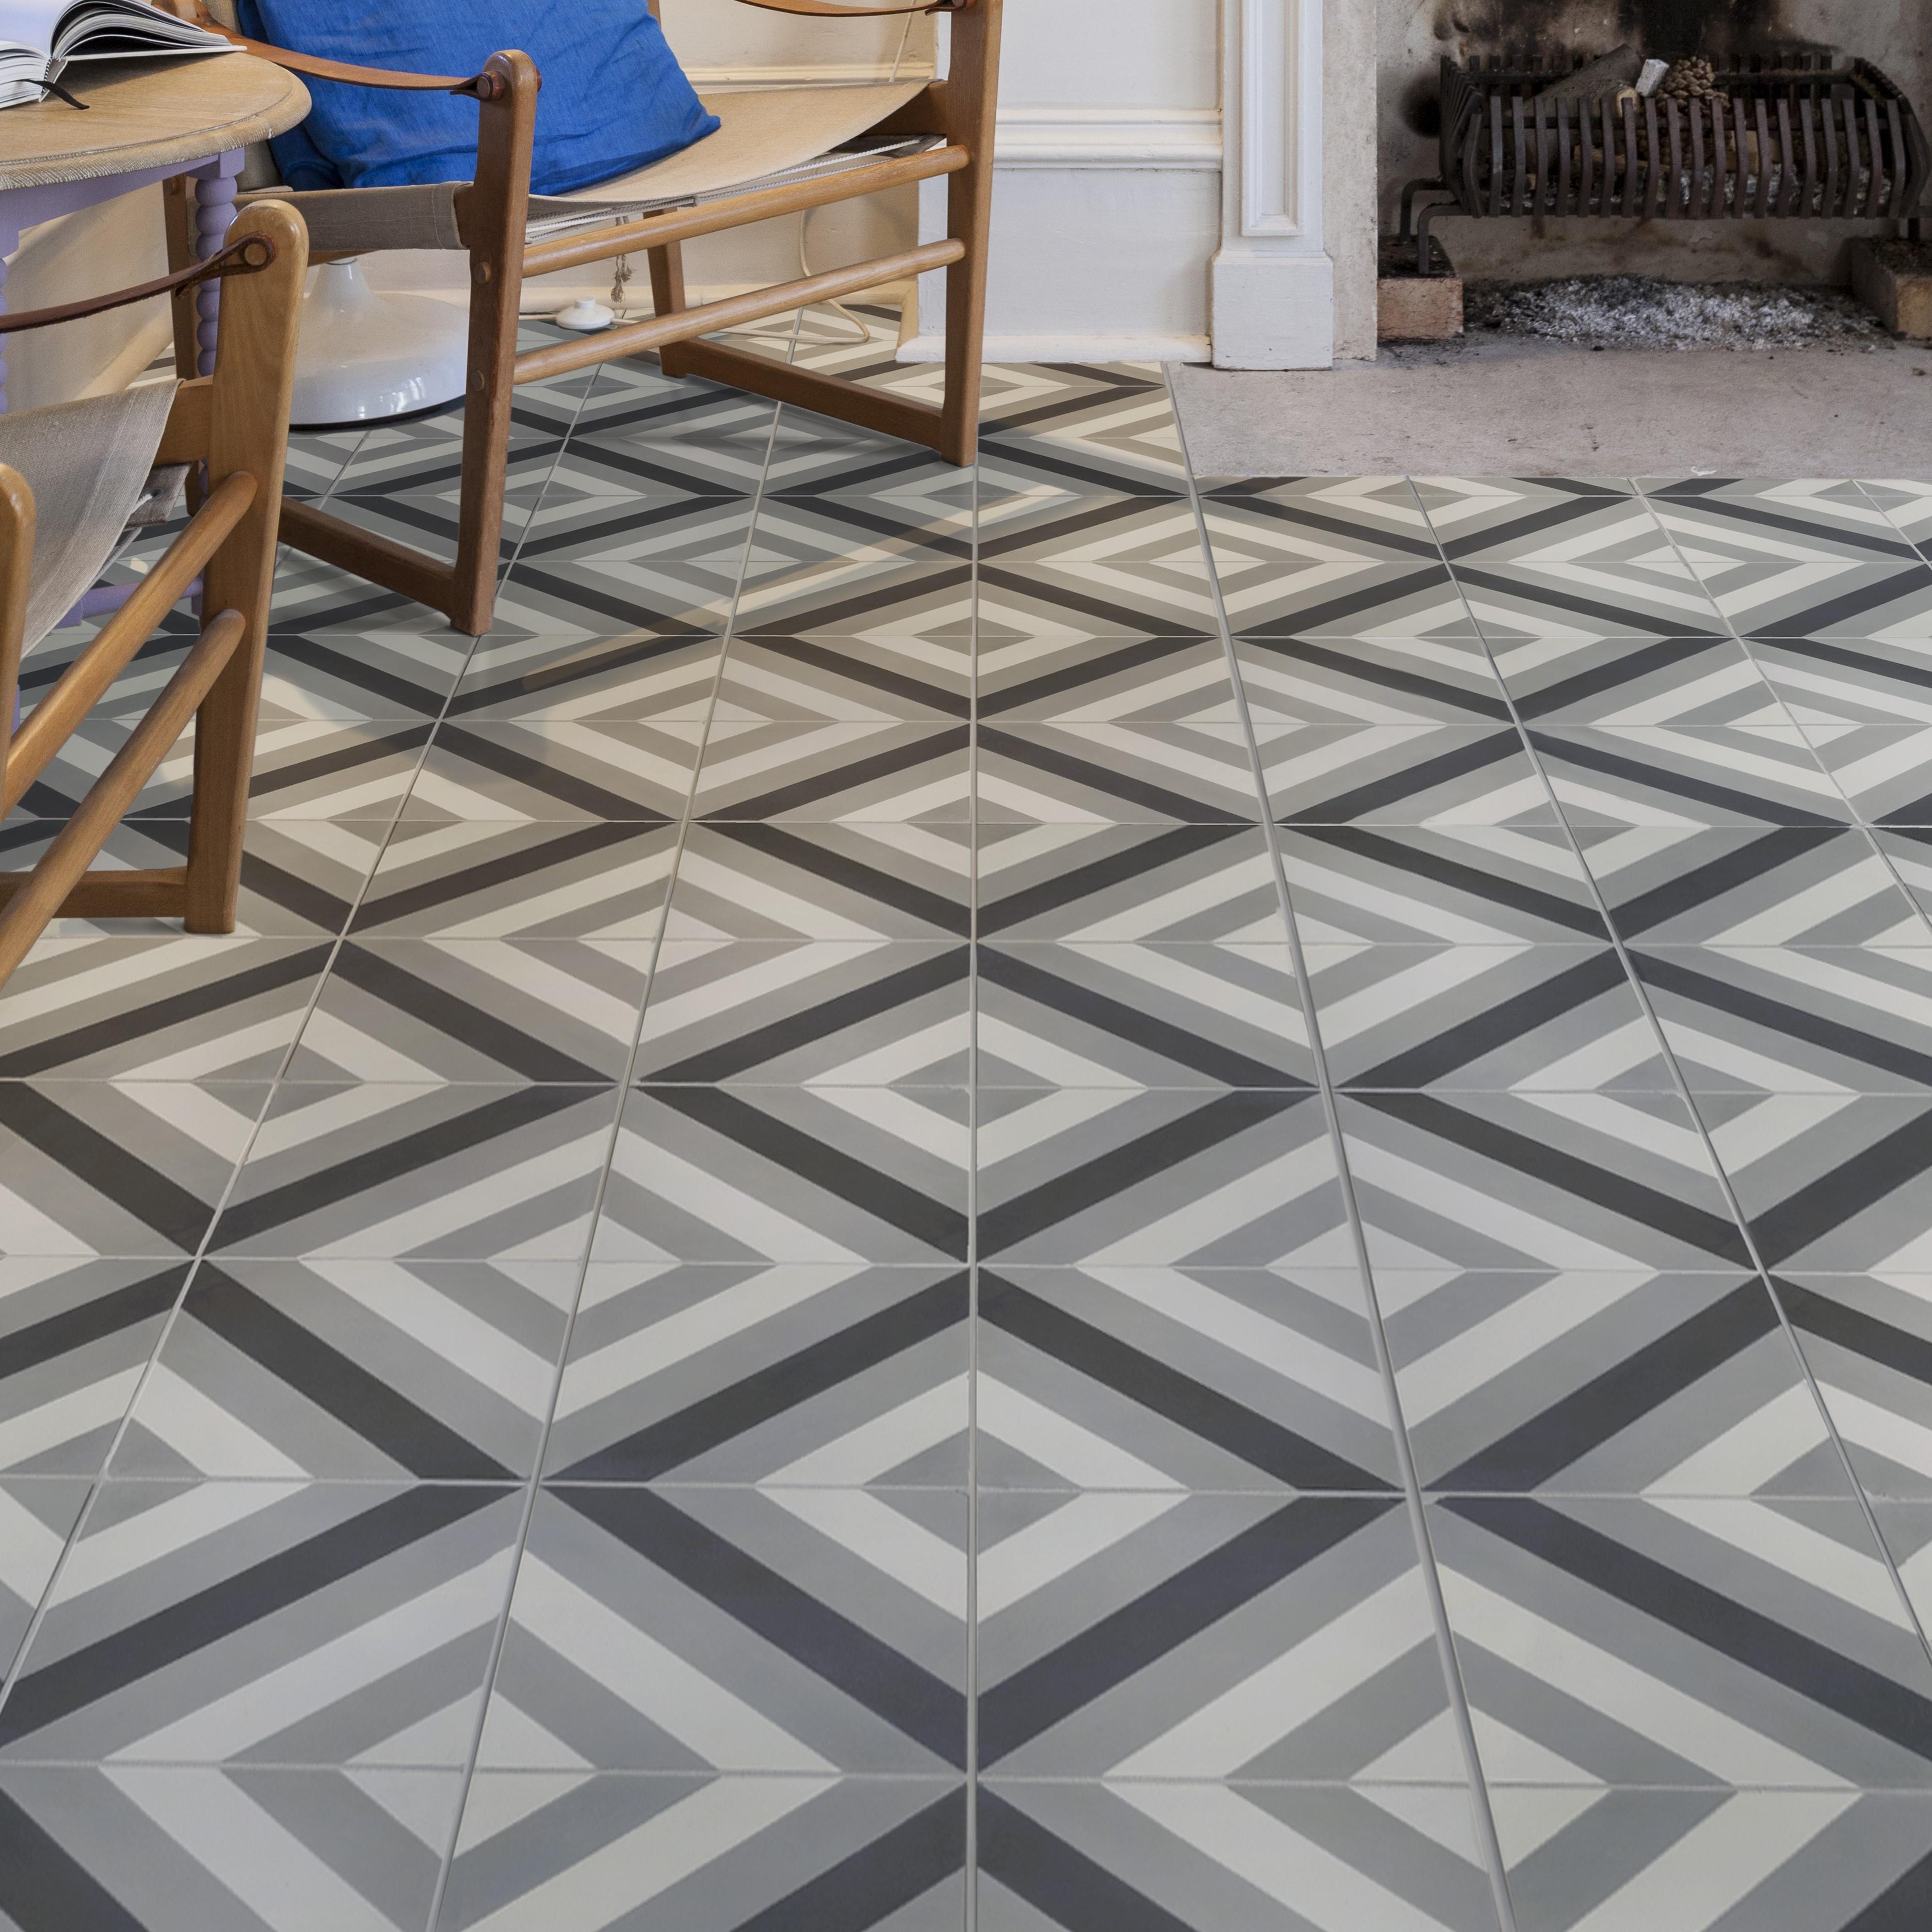 Cement edinburgh tile studio ca pietra encaustic brighton dailygadgetfo Gallery